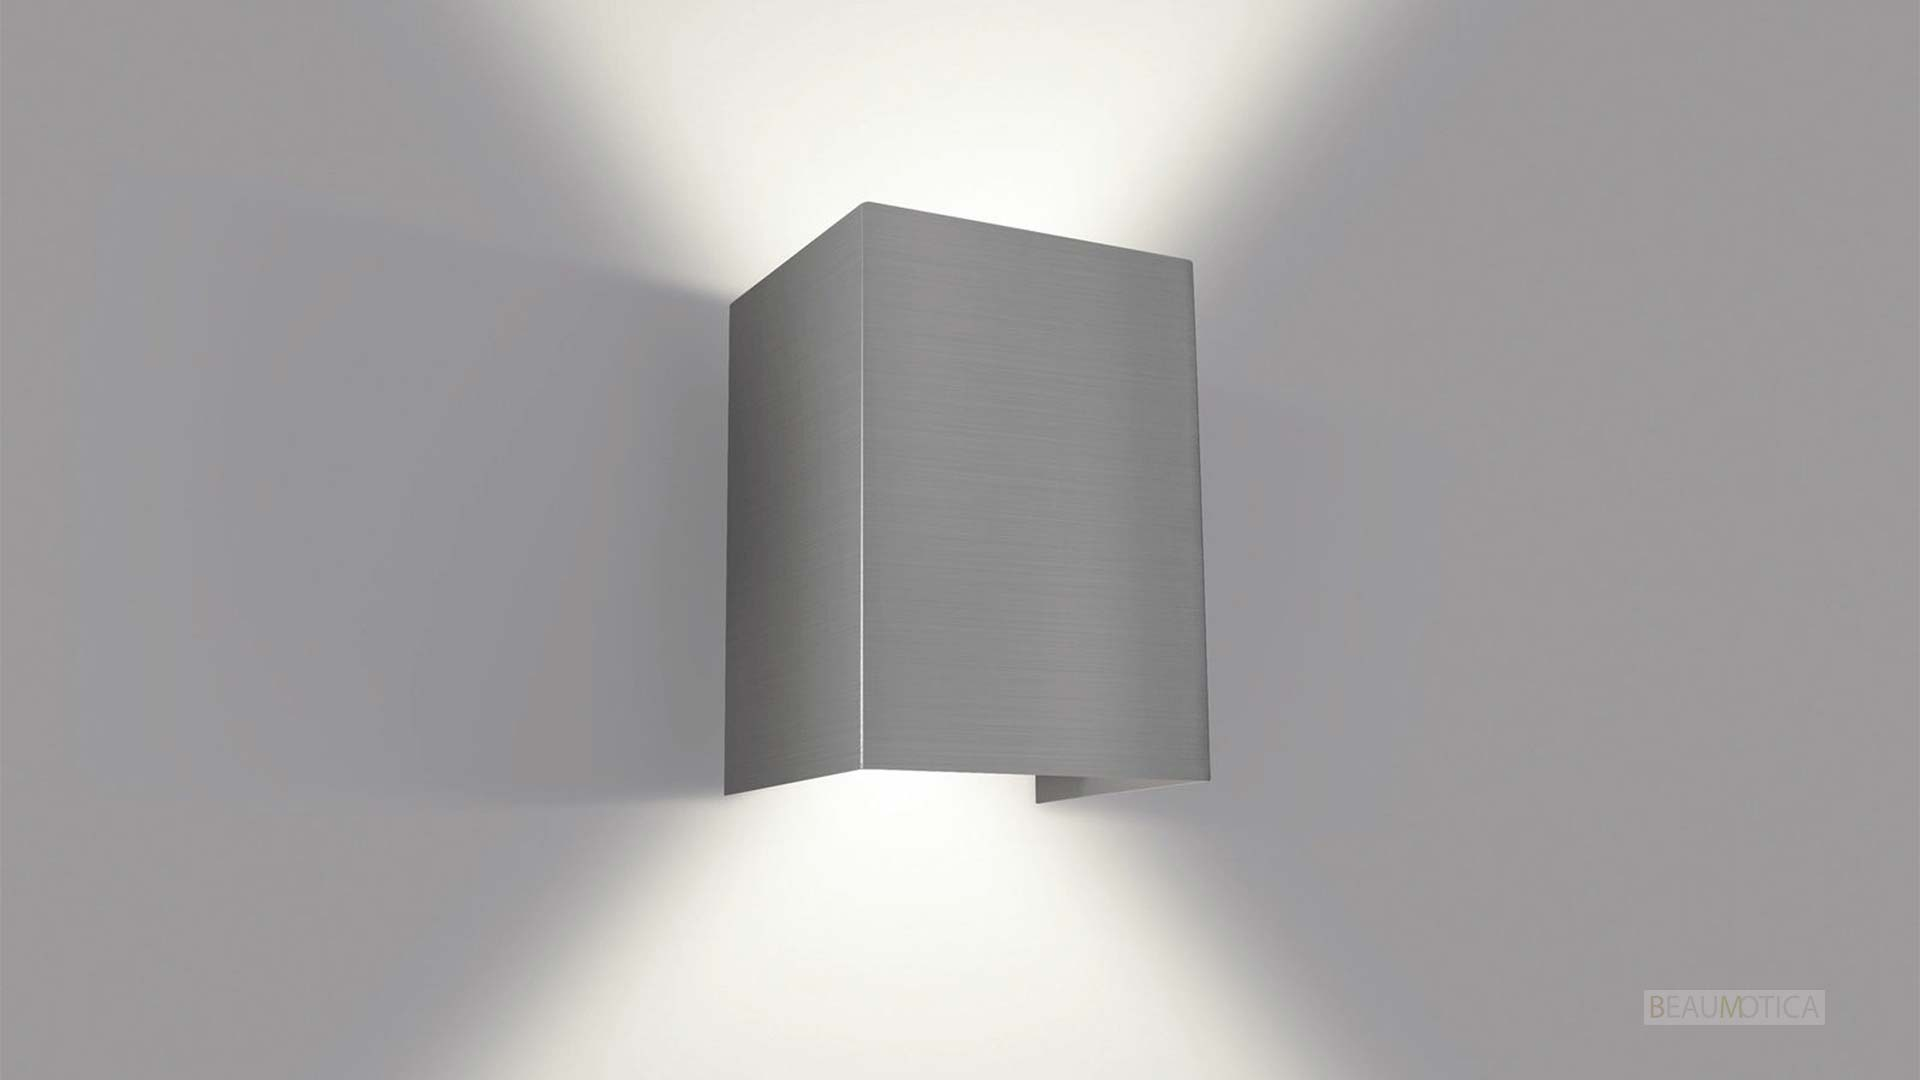 wandlampen led led verlichting watt. Black Bedroom Furniture Sets. Home Design Ideas